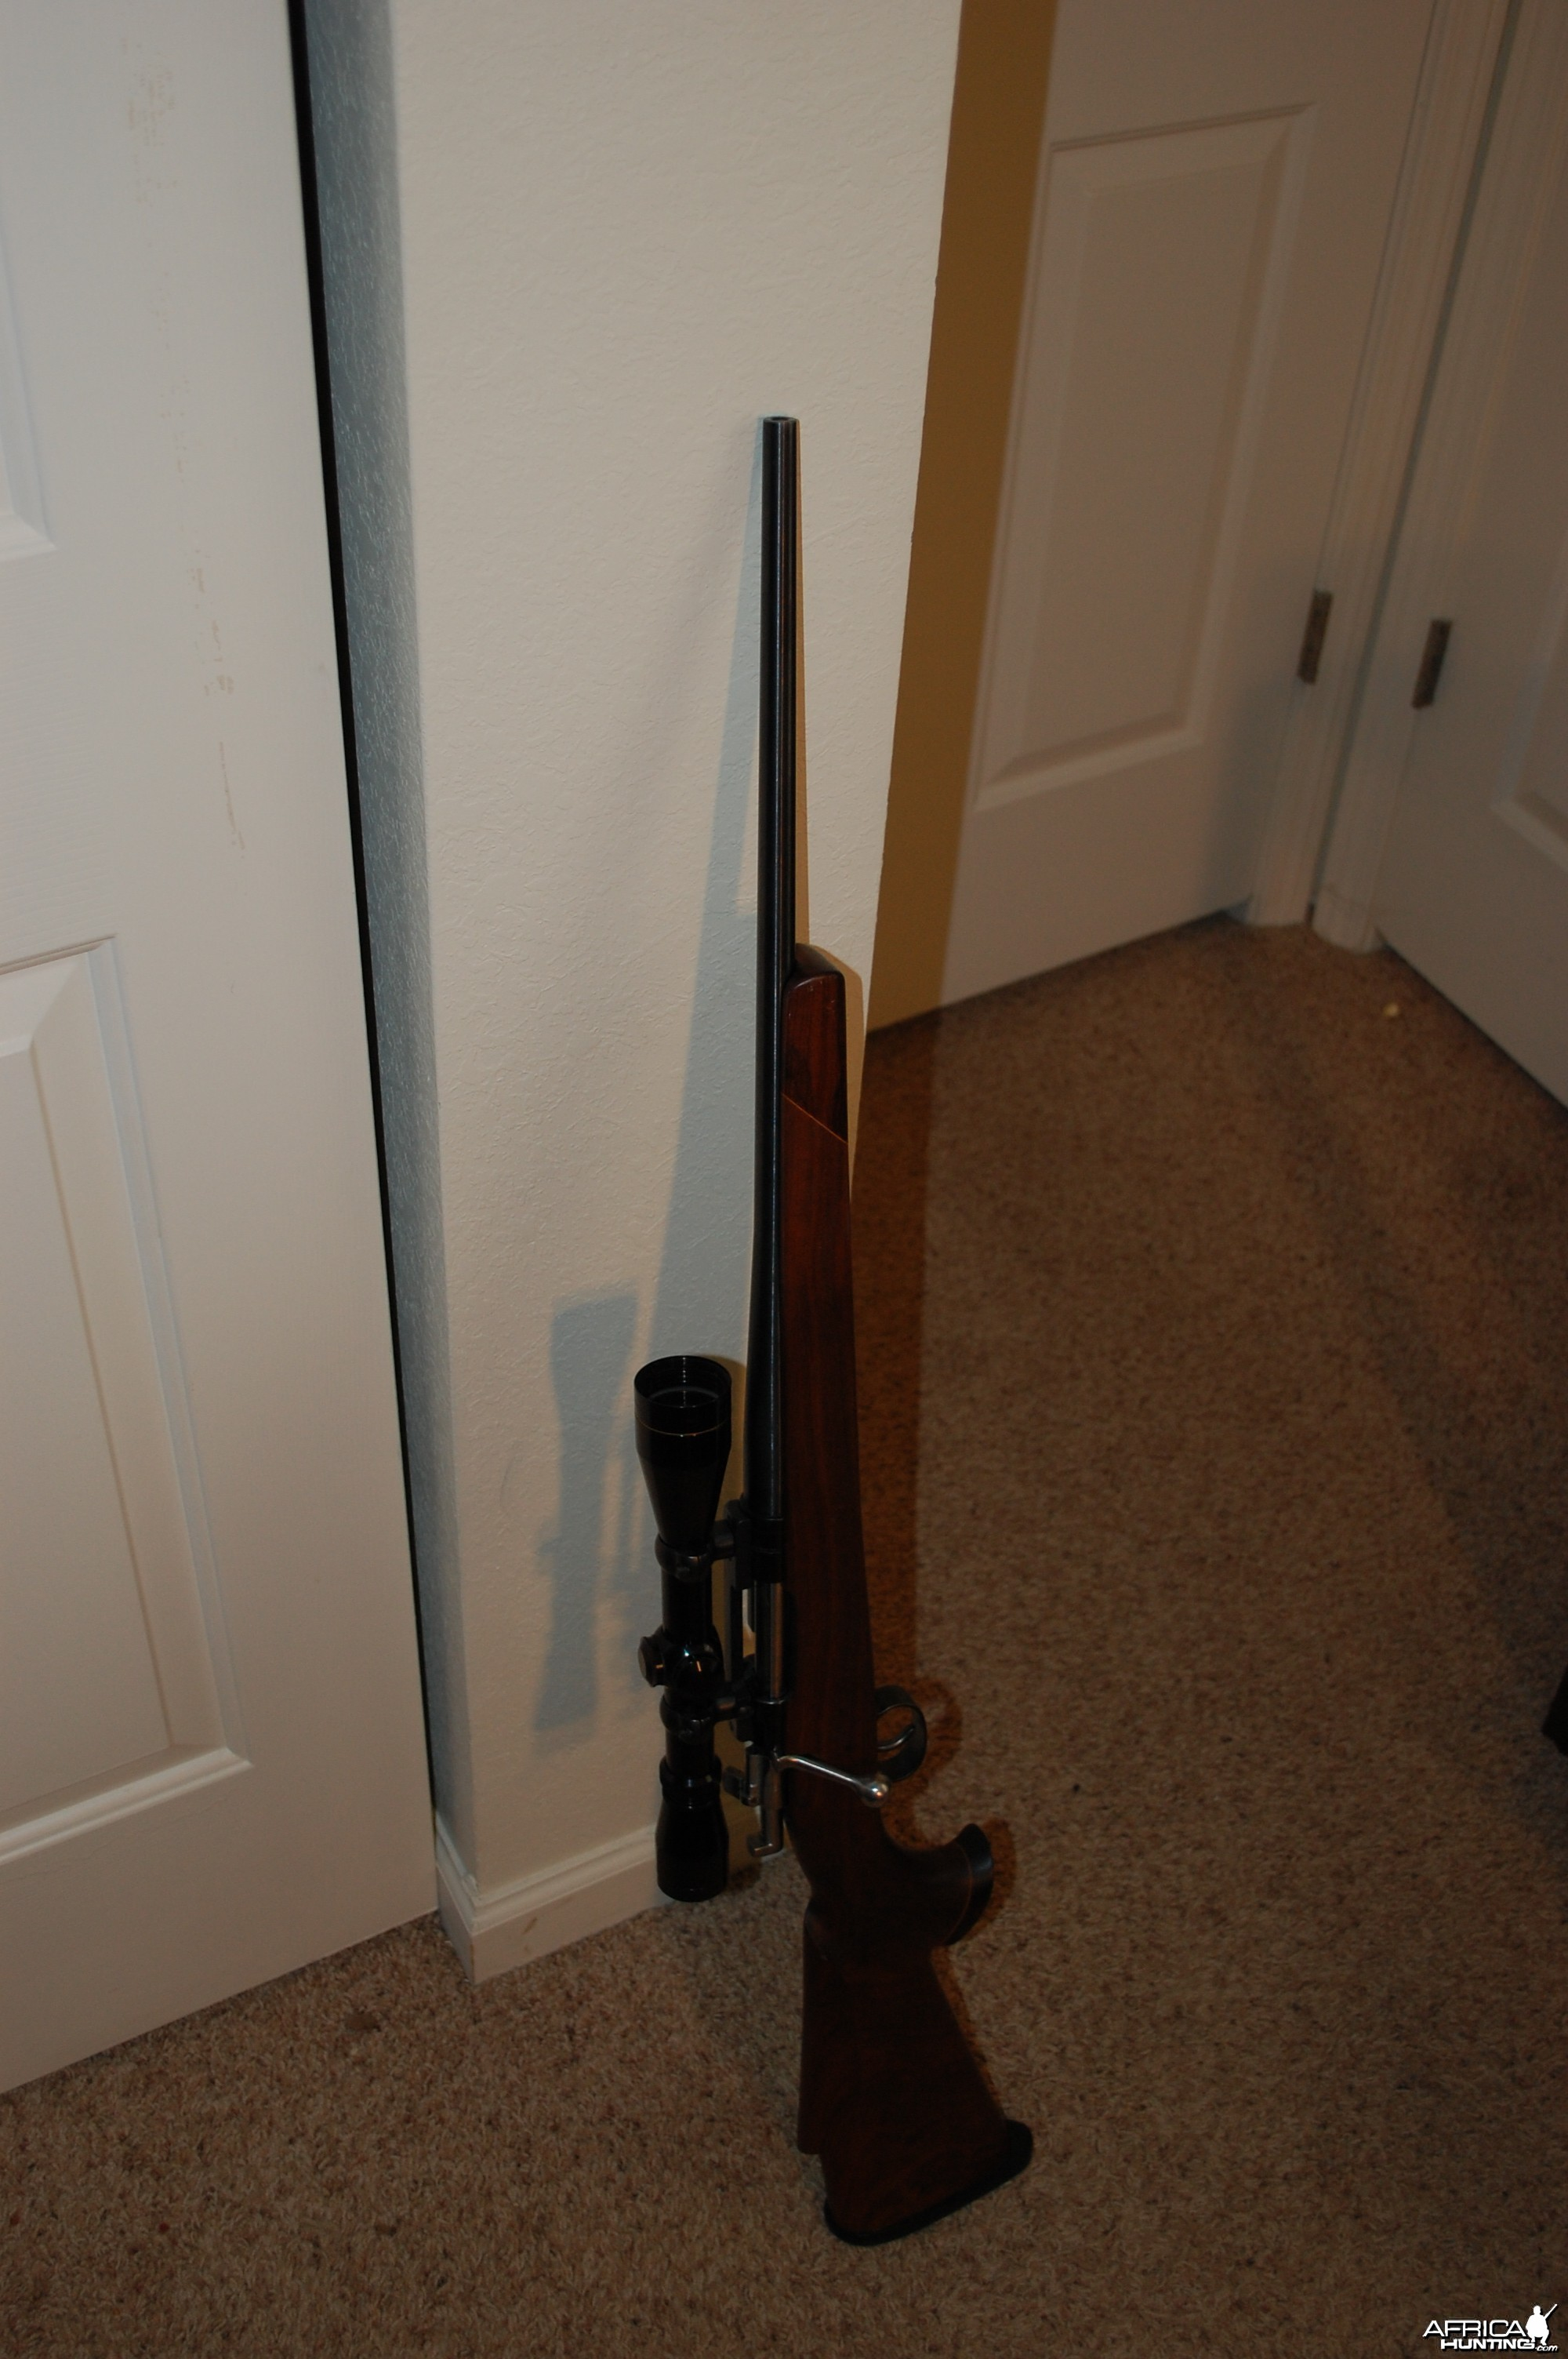 Mauser 96/38